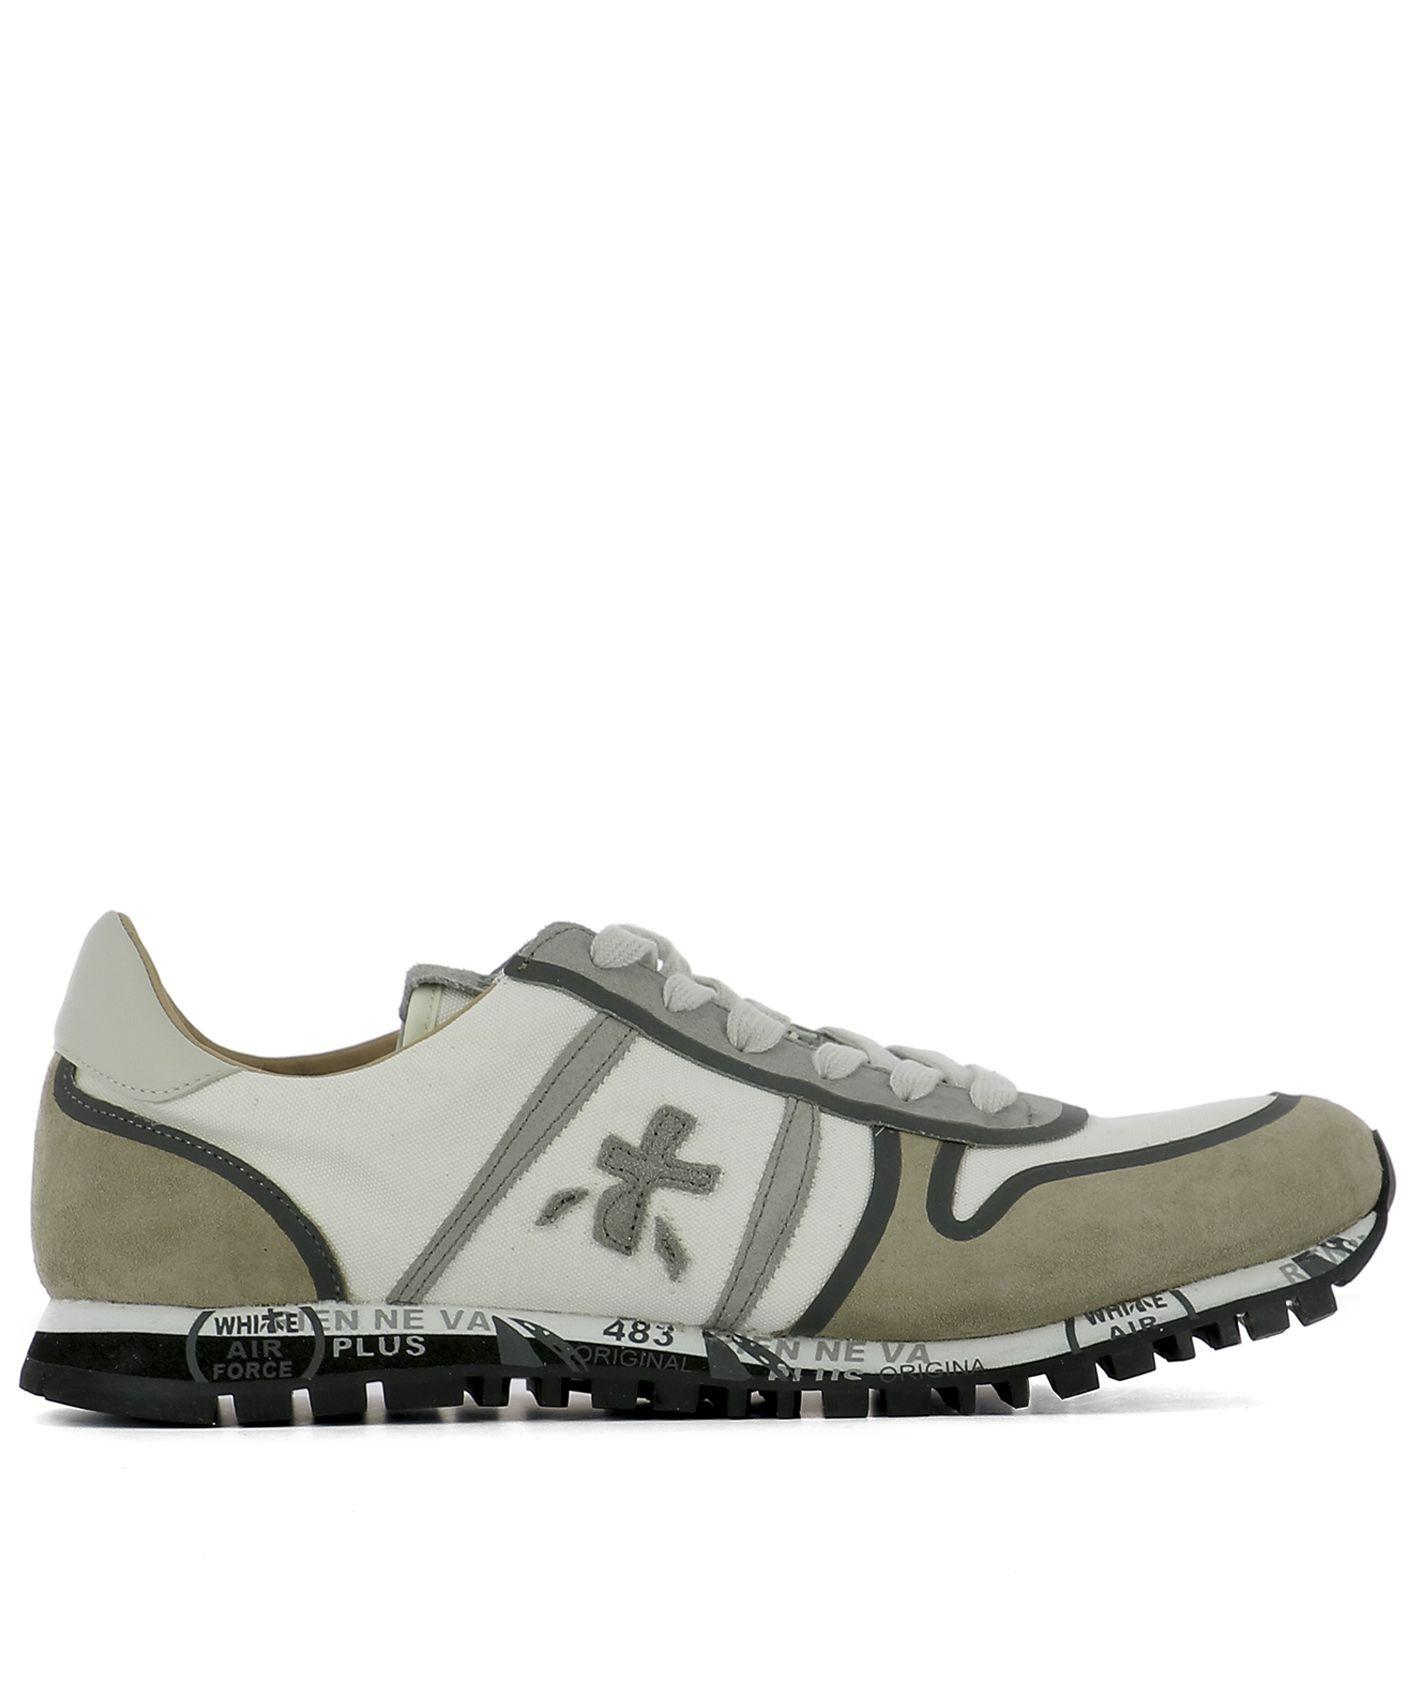 Premiata White Fabric Sneakers